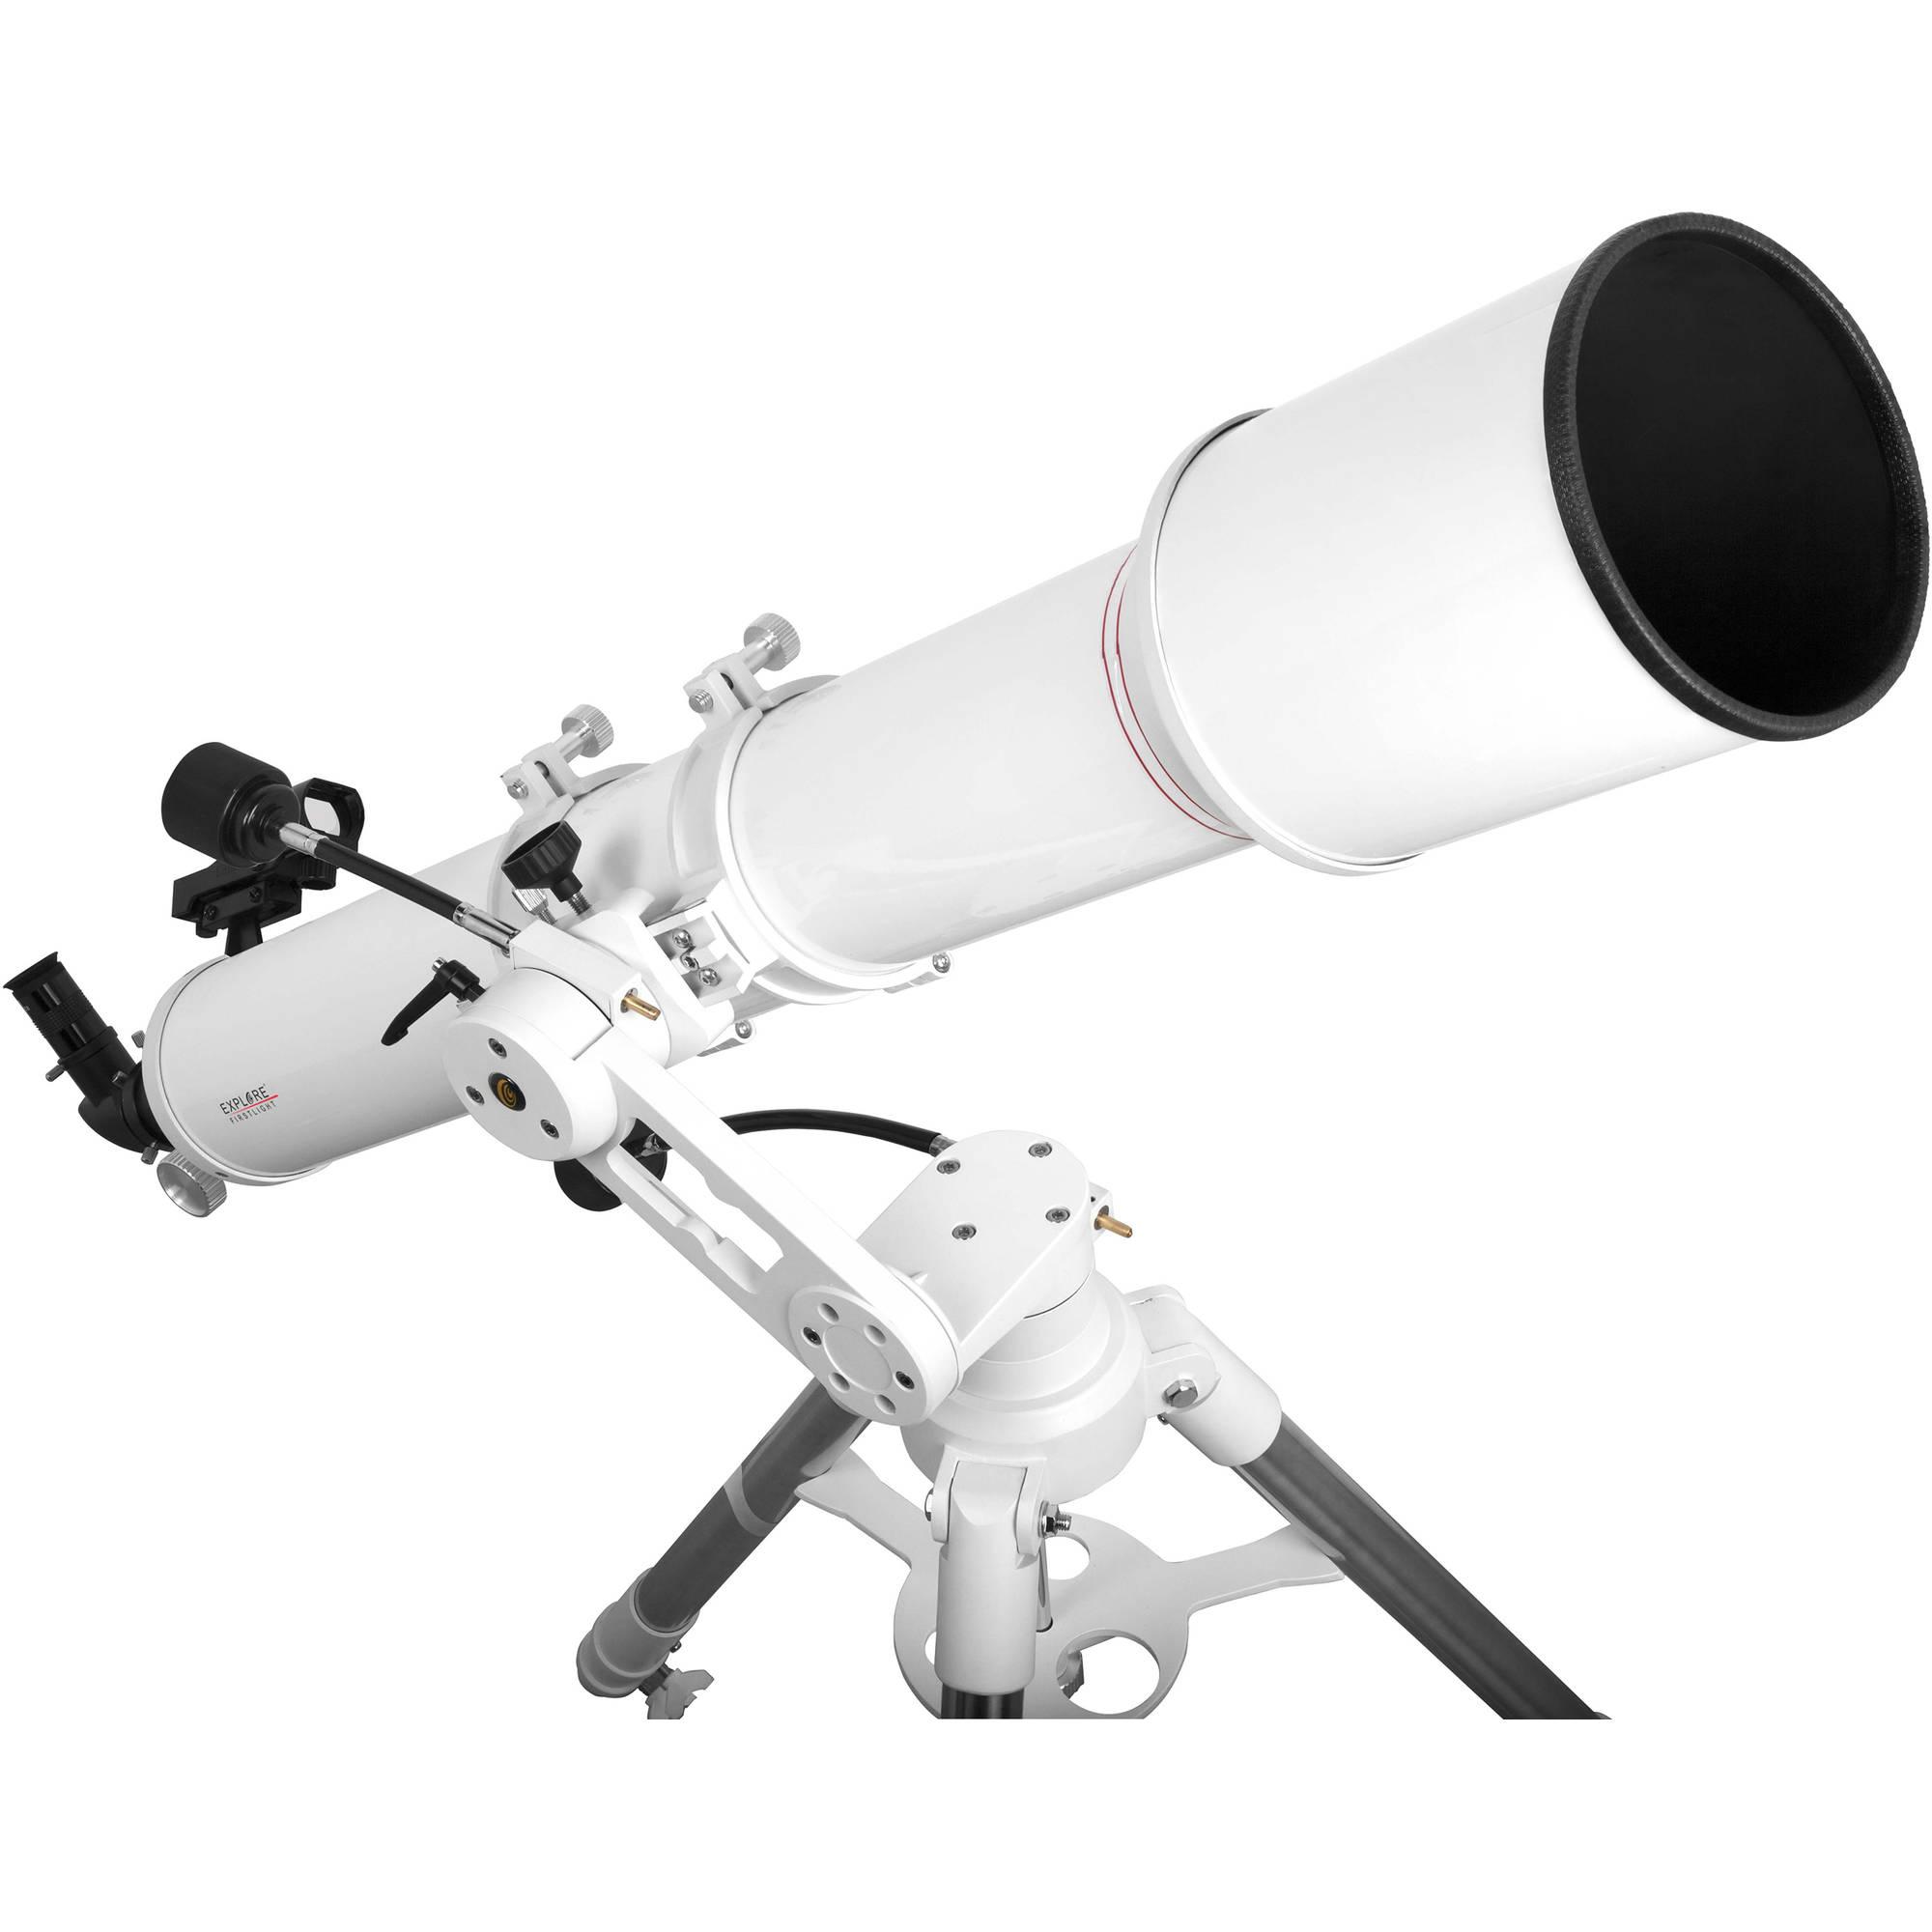 Explore Scientific FirstLight 127mm f/9 4 Alt-Az Refractor Telescope